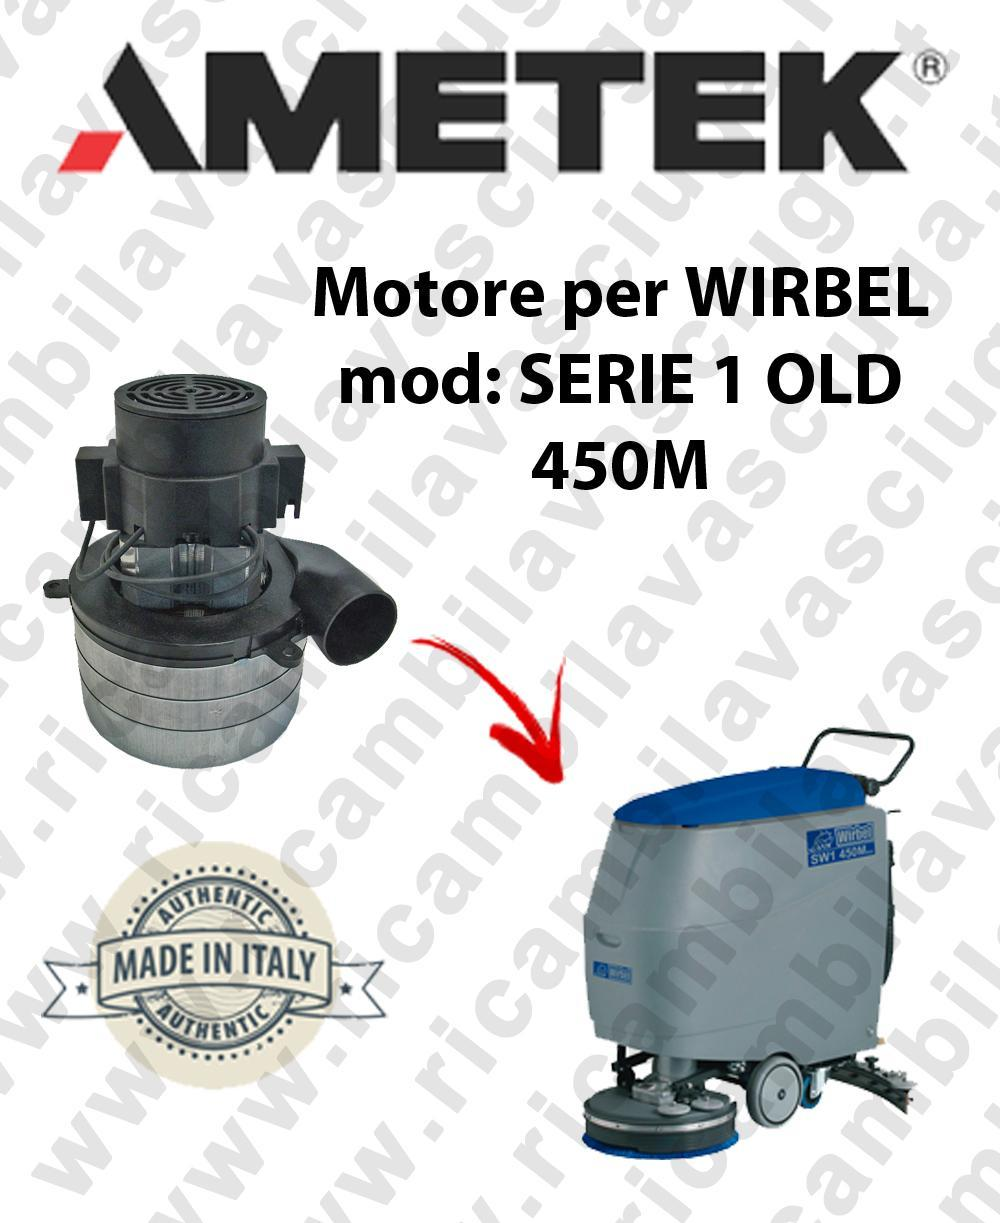 SERIE 1 OLD 450M Ametek vacuum motor for scrubber dryer WIRBEL